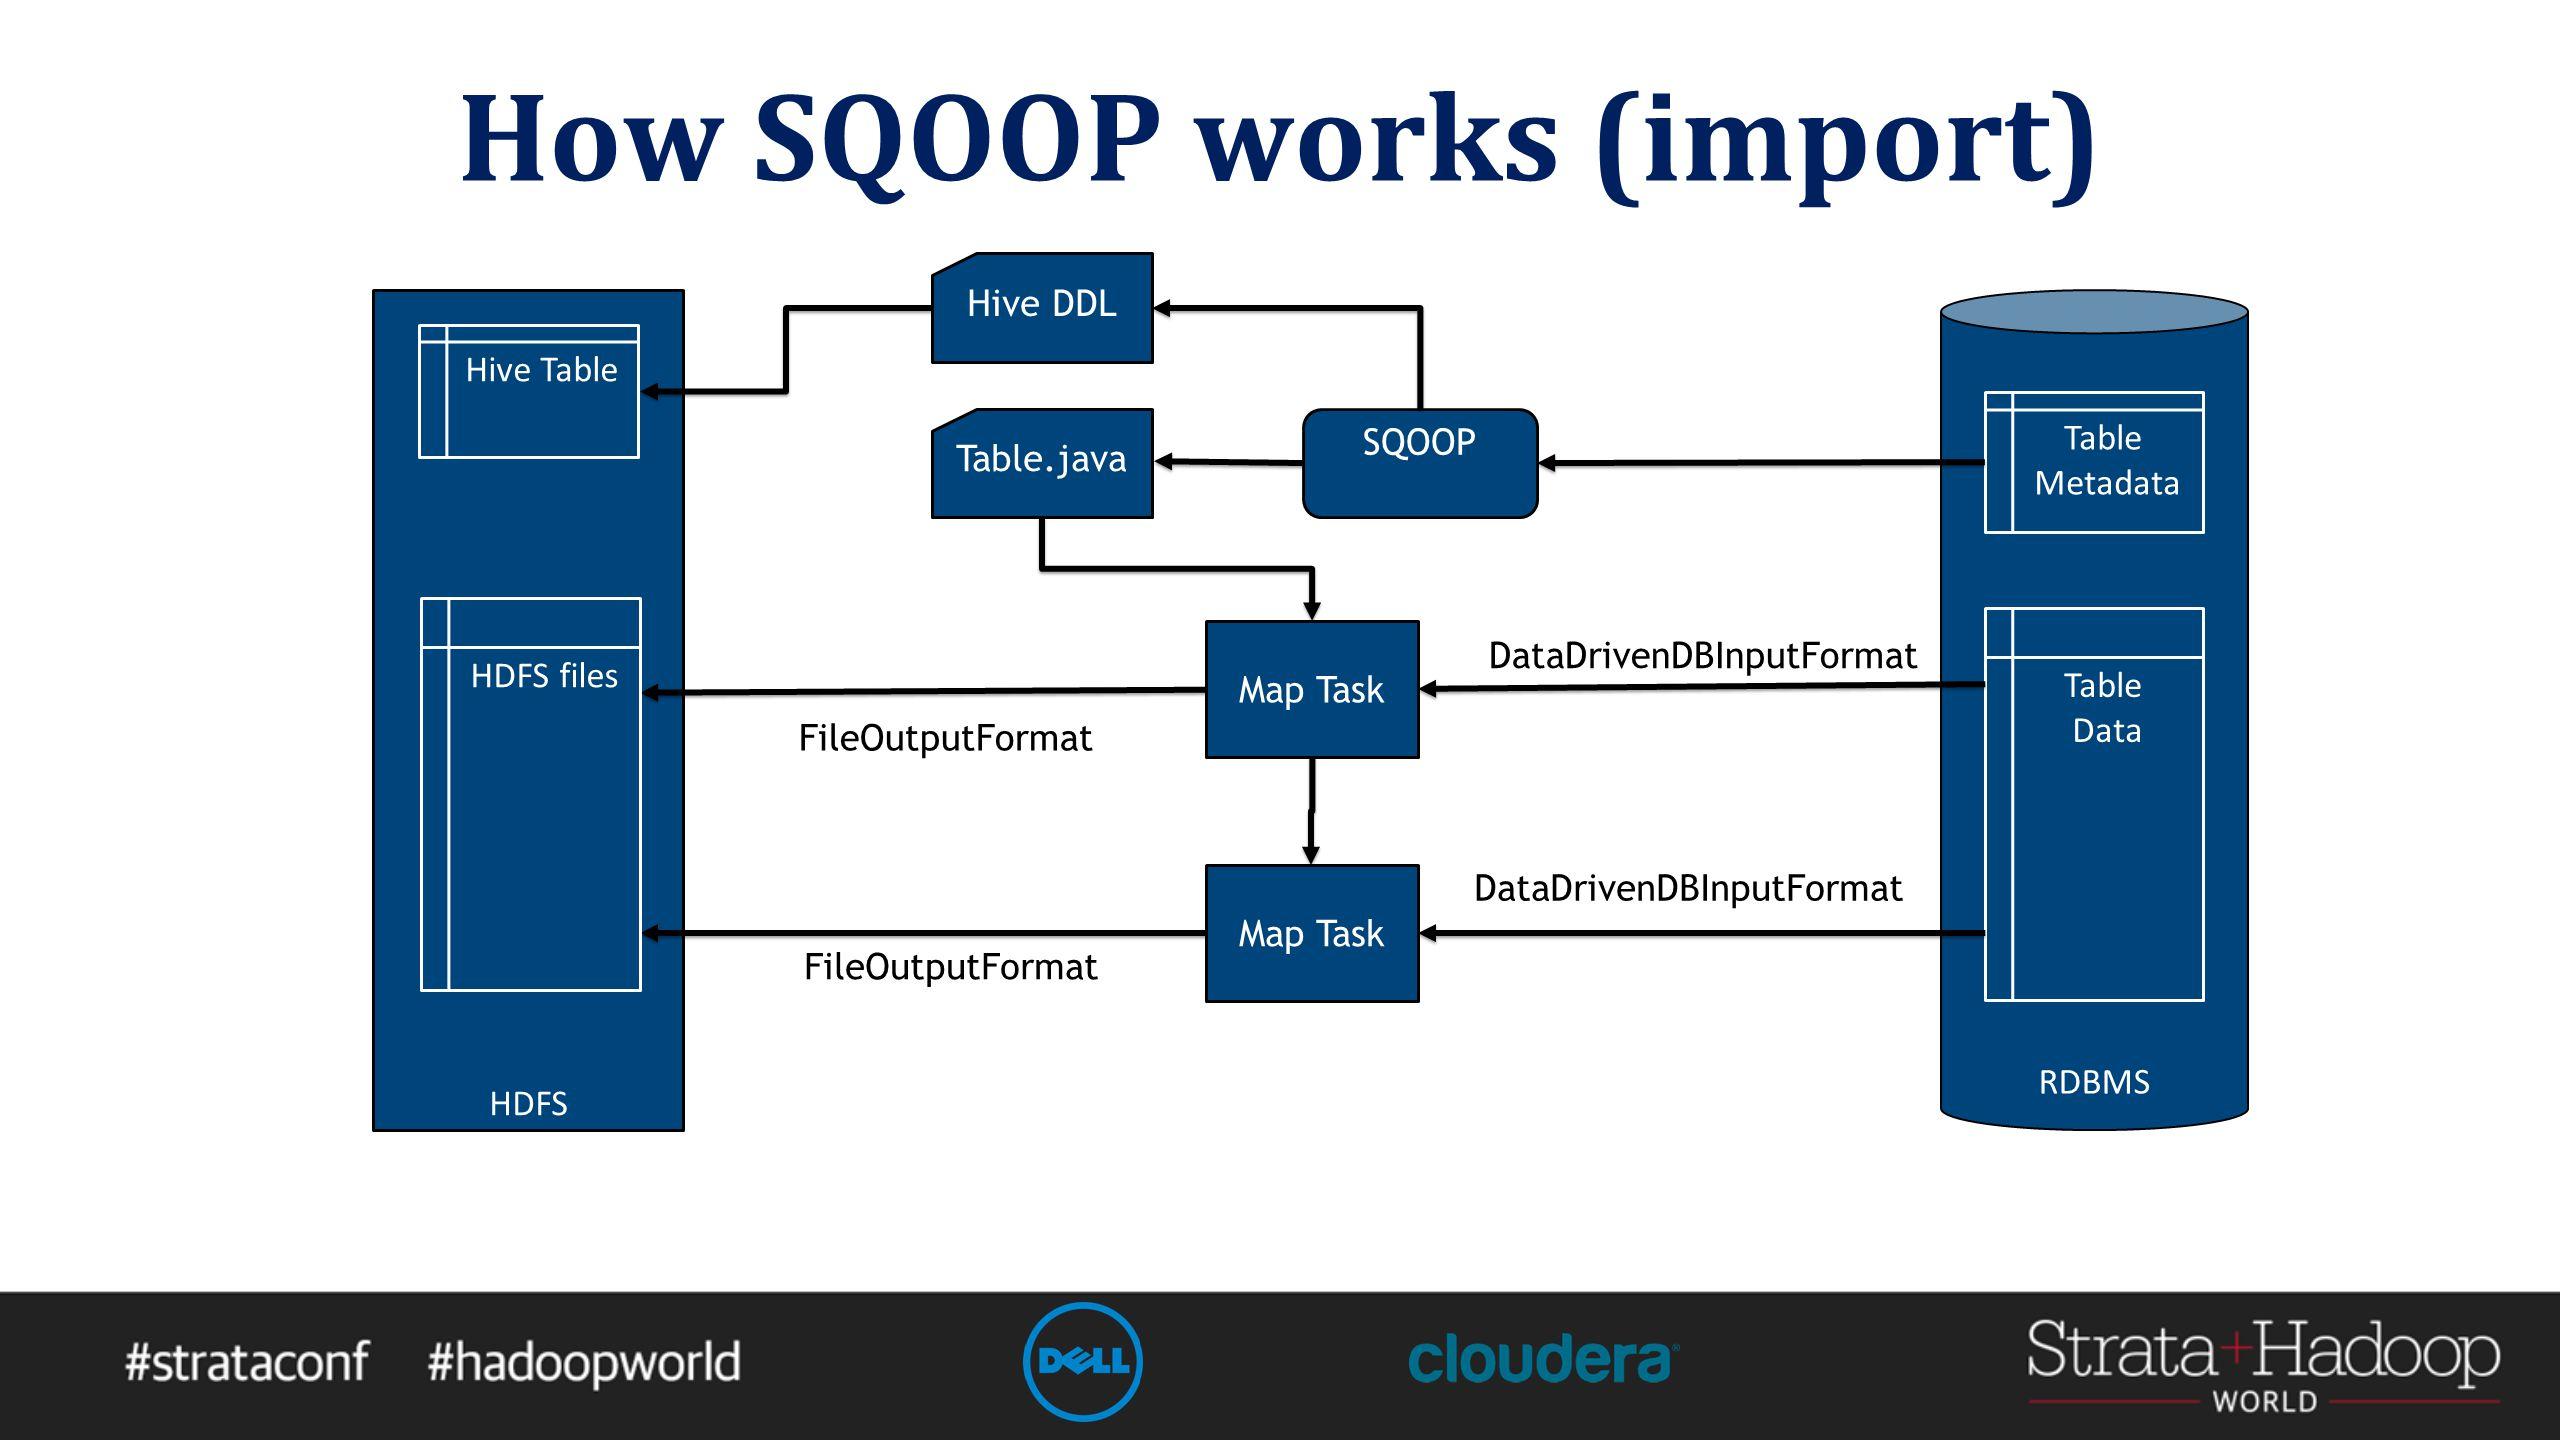 How SQOOP works (import) HDFS RDBMS Table Metadata Table Data SQOOP Table.java Map Task FileOutputFormat DataDrivenDBInputFormat Map Task DataDrivenDBInputFormat FileOutputFormat Hive DDL HDFS files Hive Table